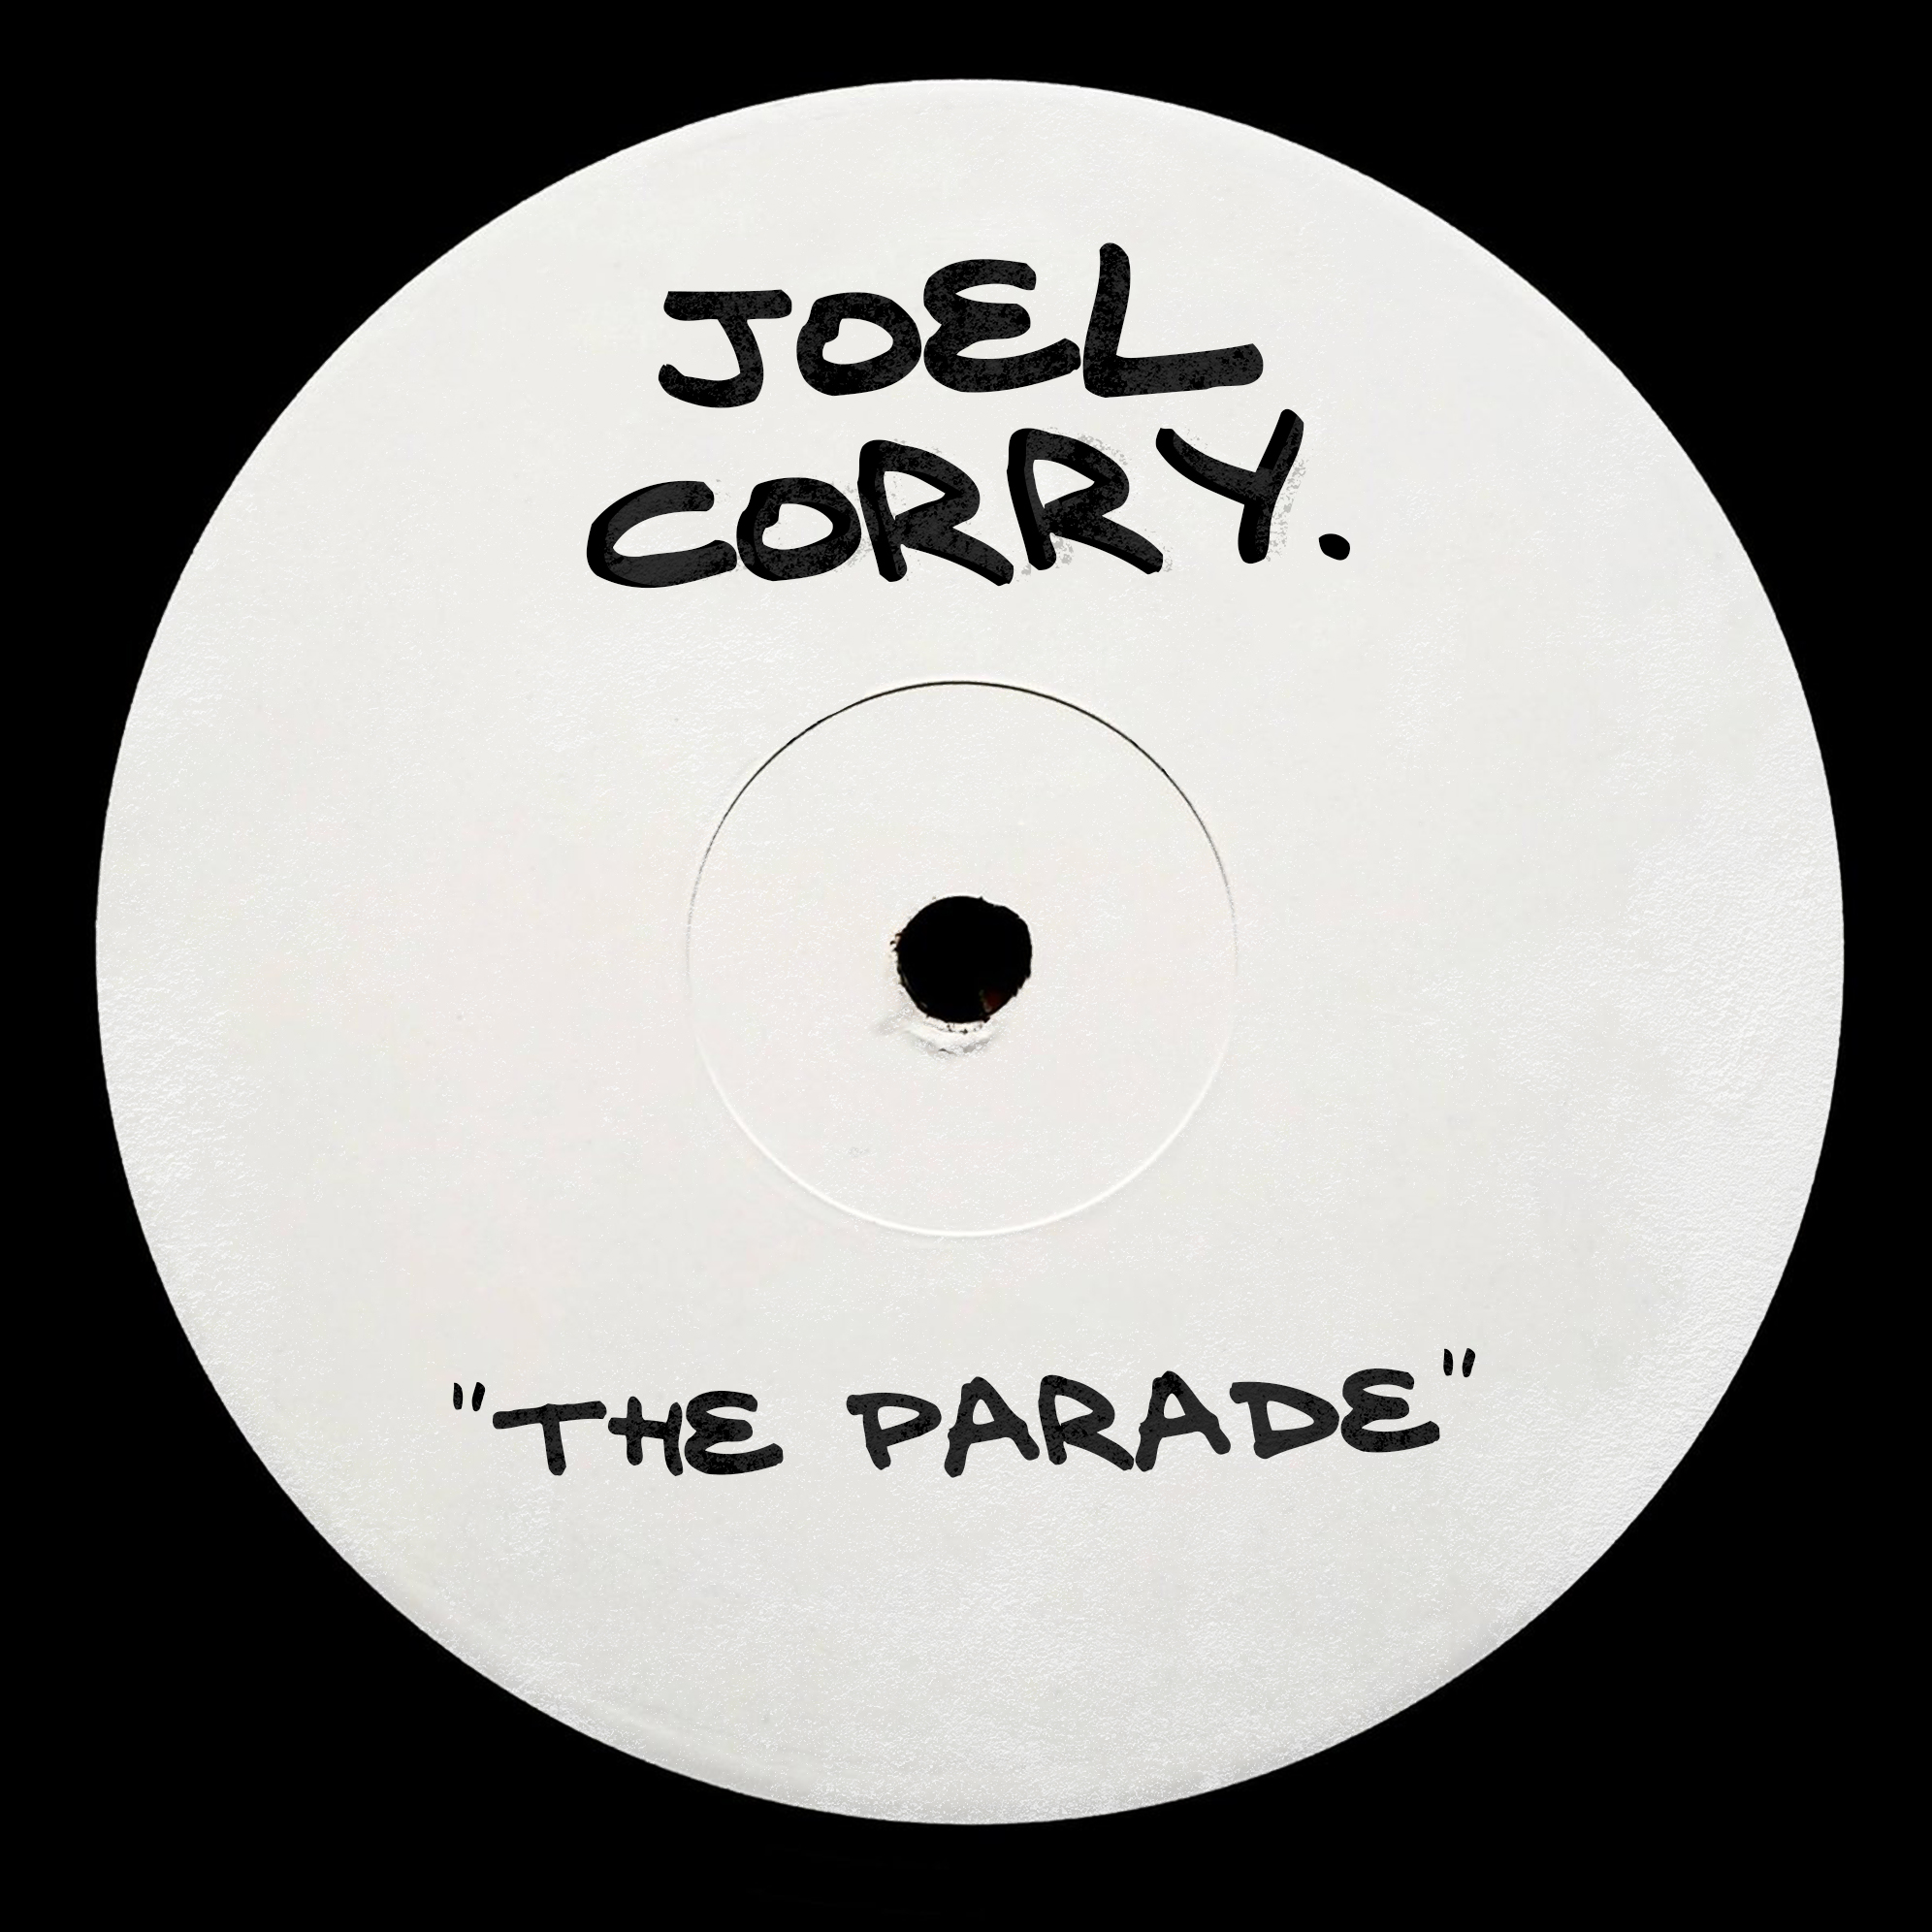 Joel Corry - The Parade.jpg